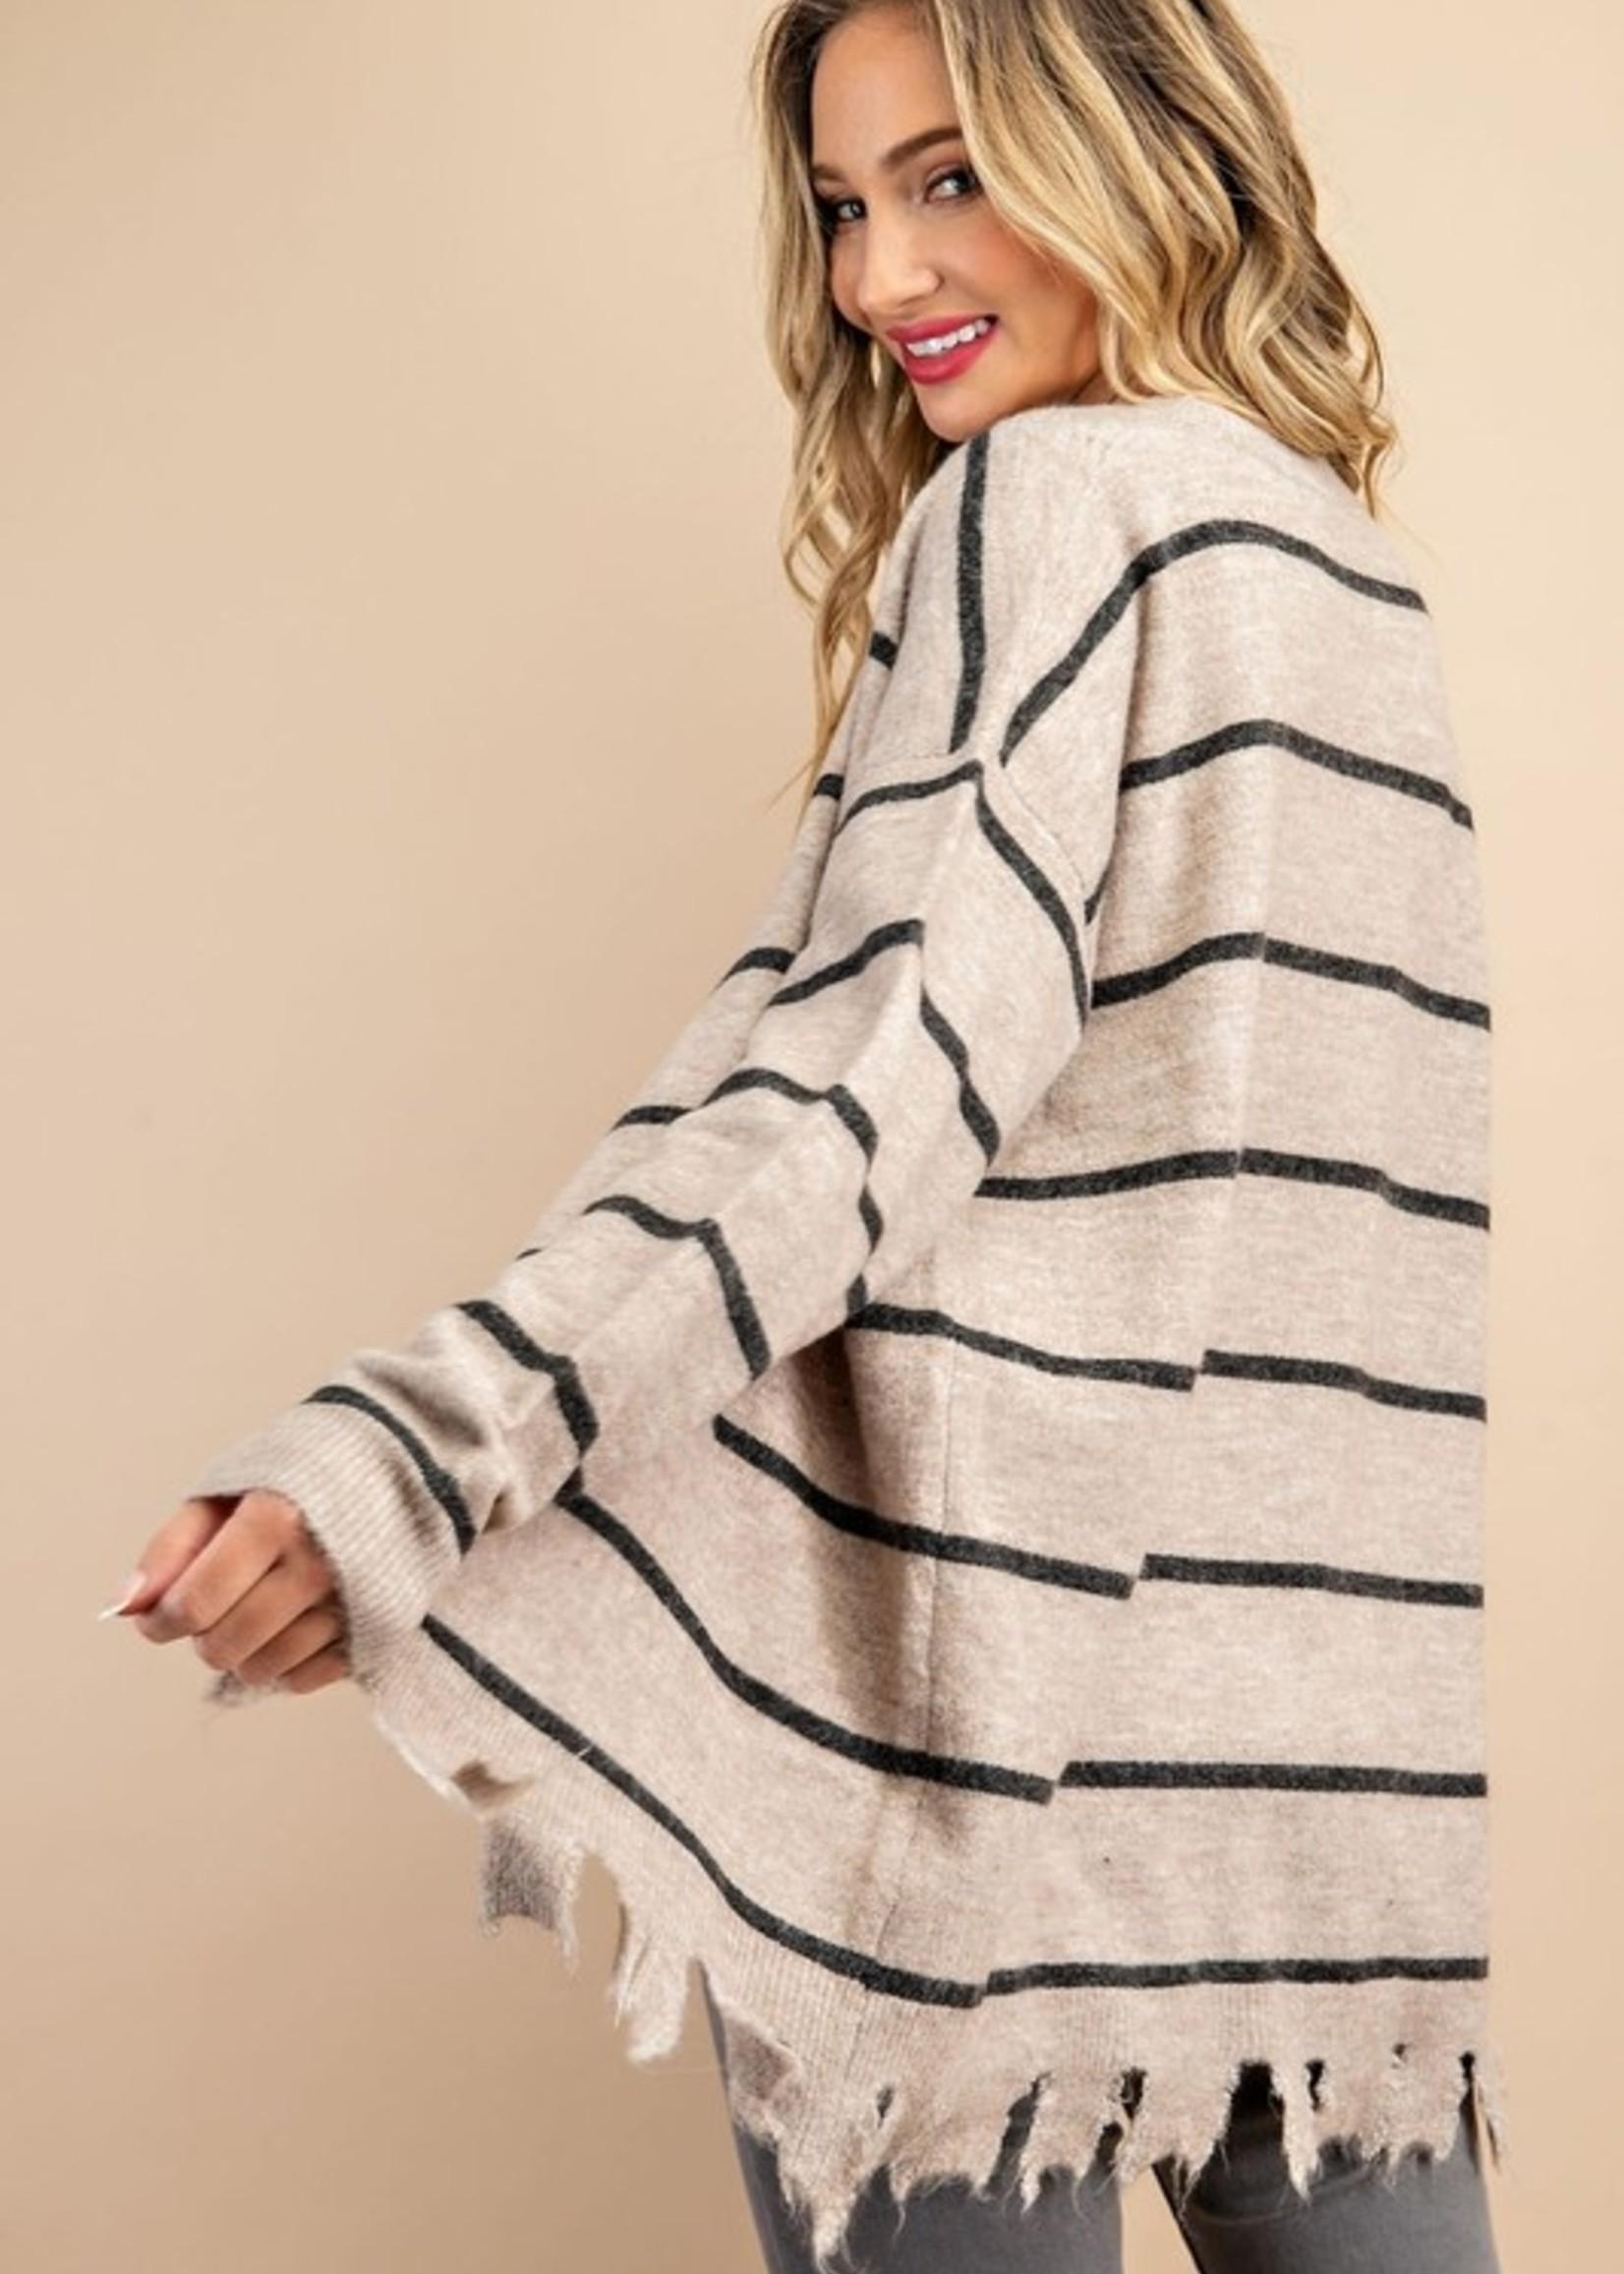 Stripe Cardigan With Distressed Hem - Oatmeal